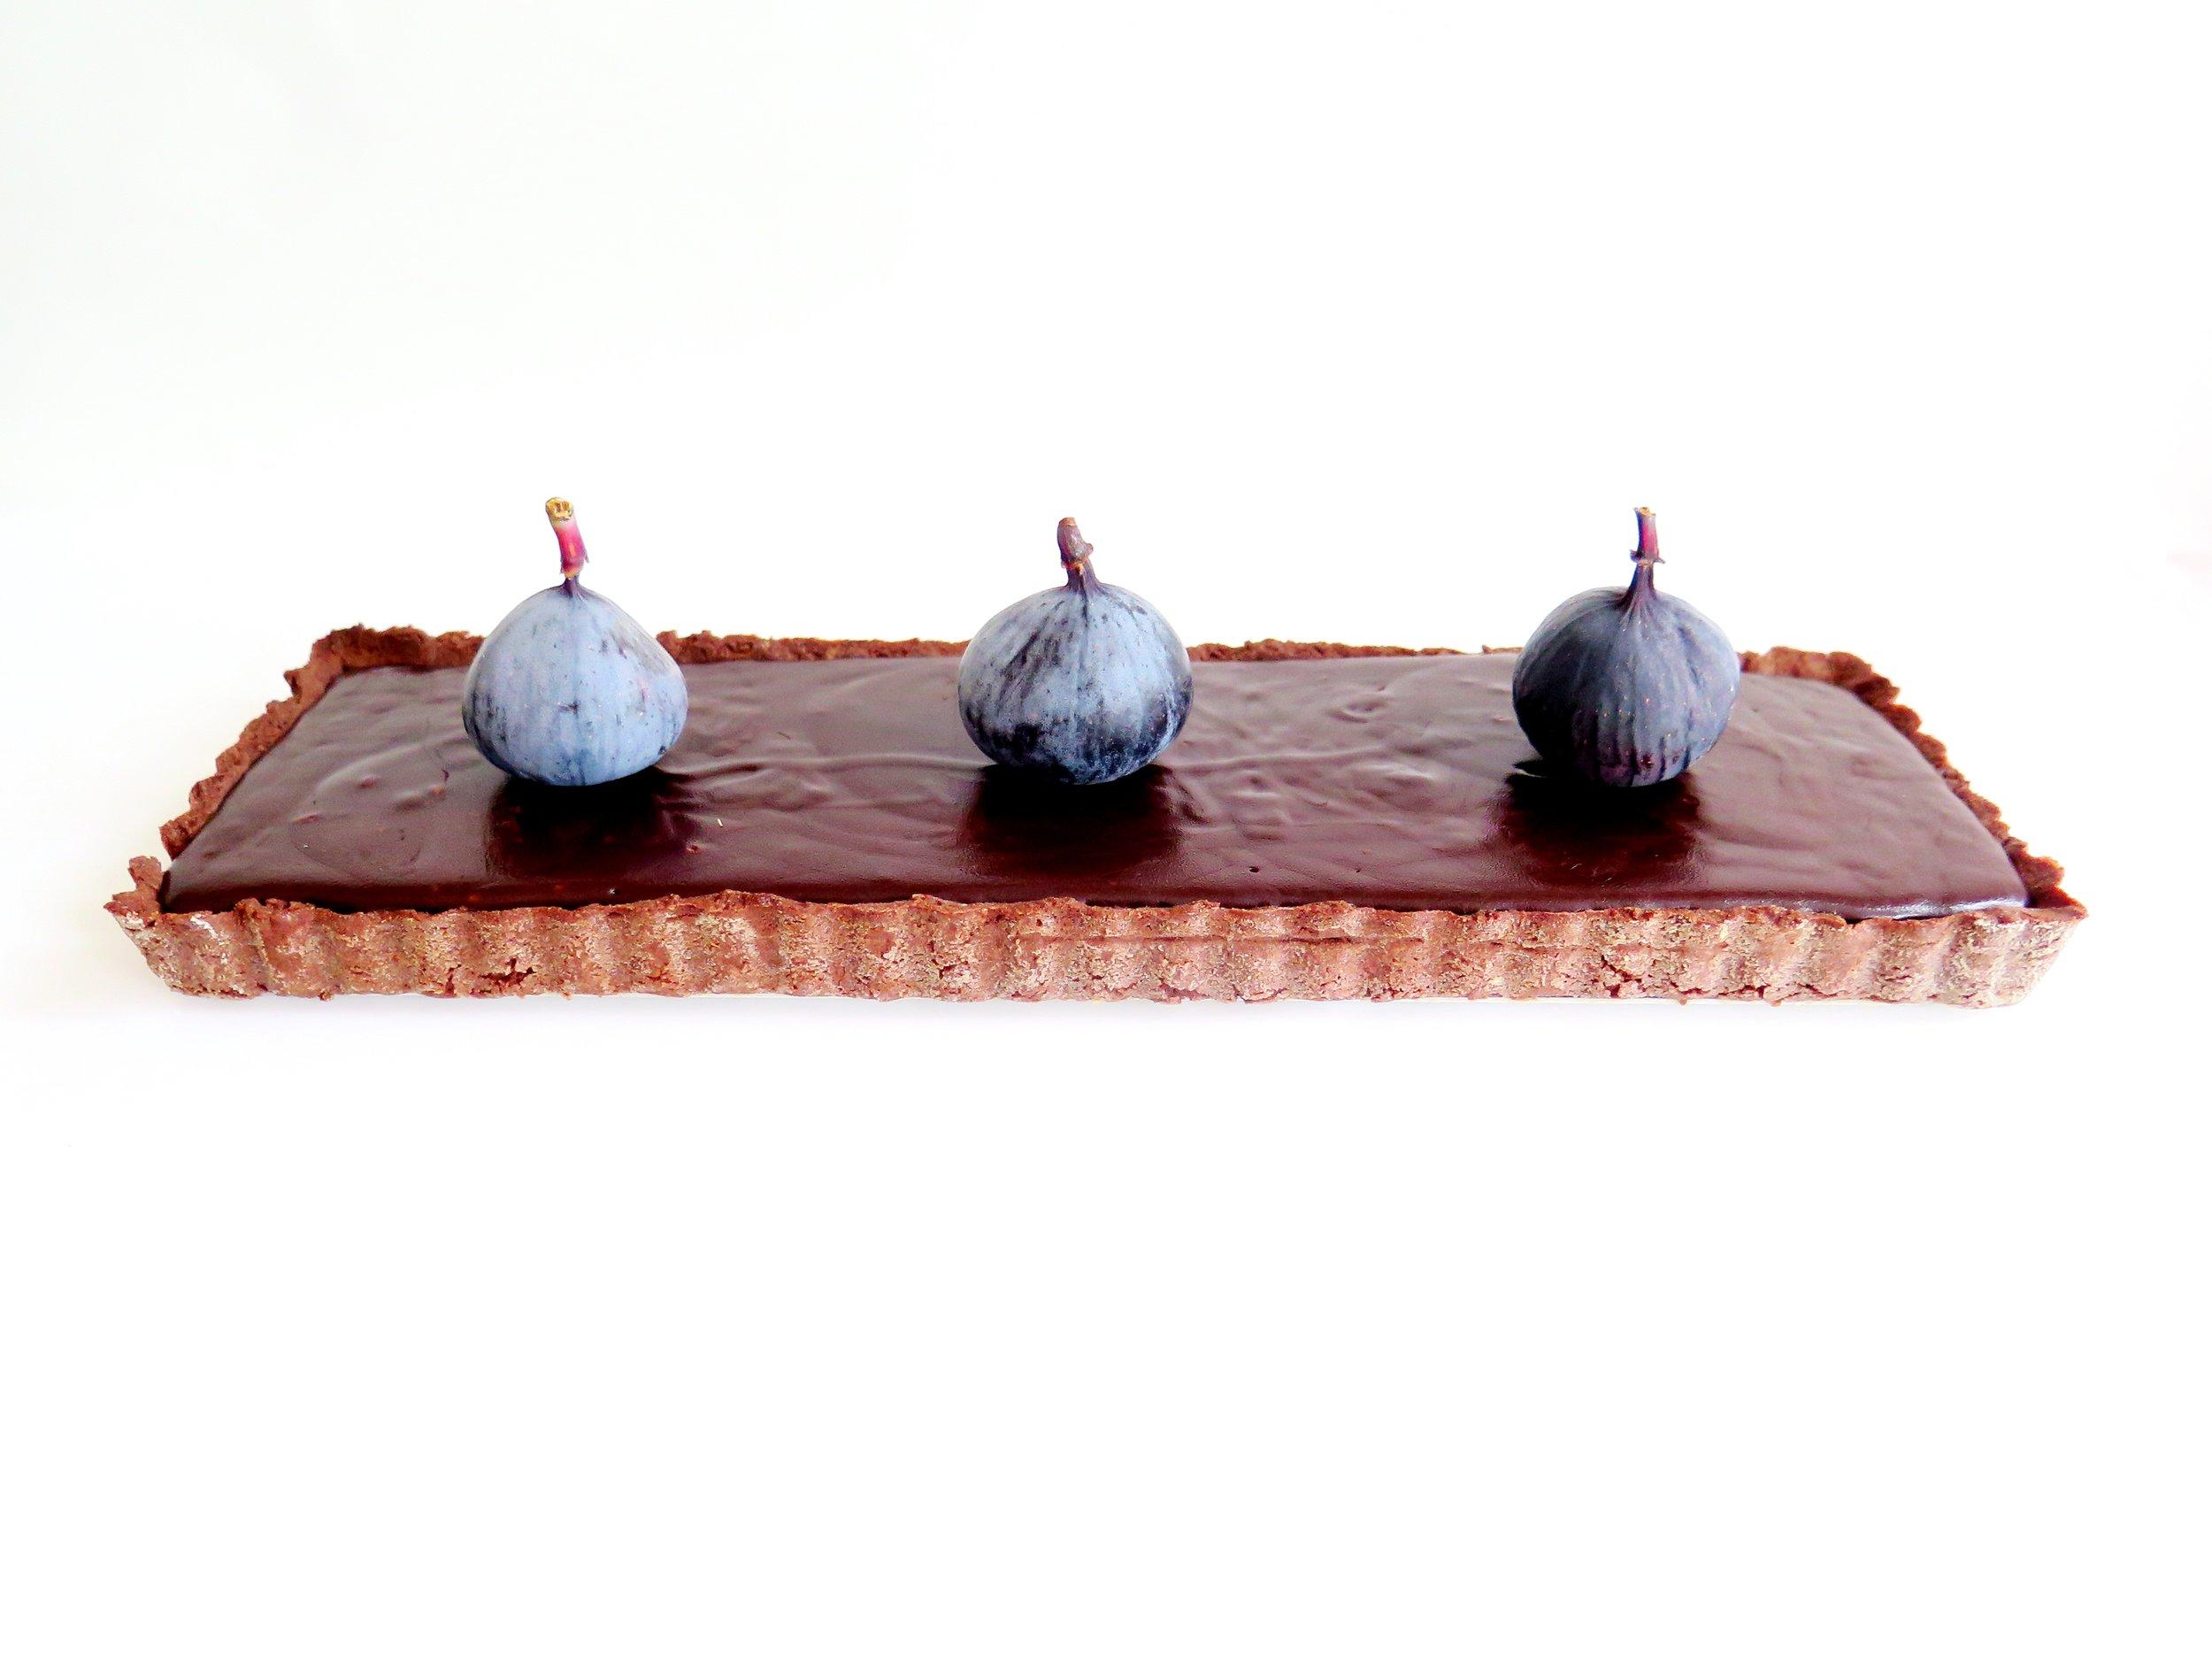 Double Chocolate Salted Caramel Tart